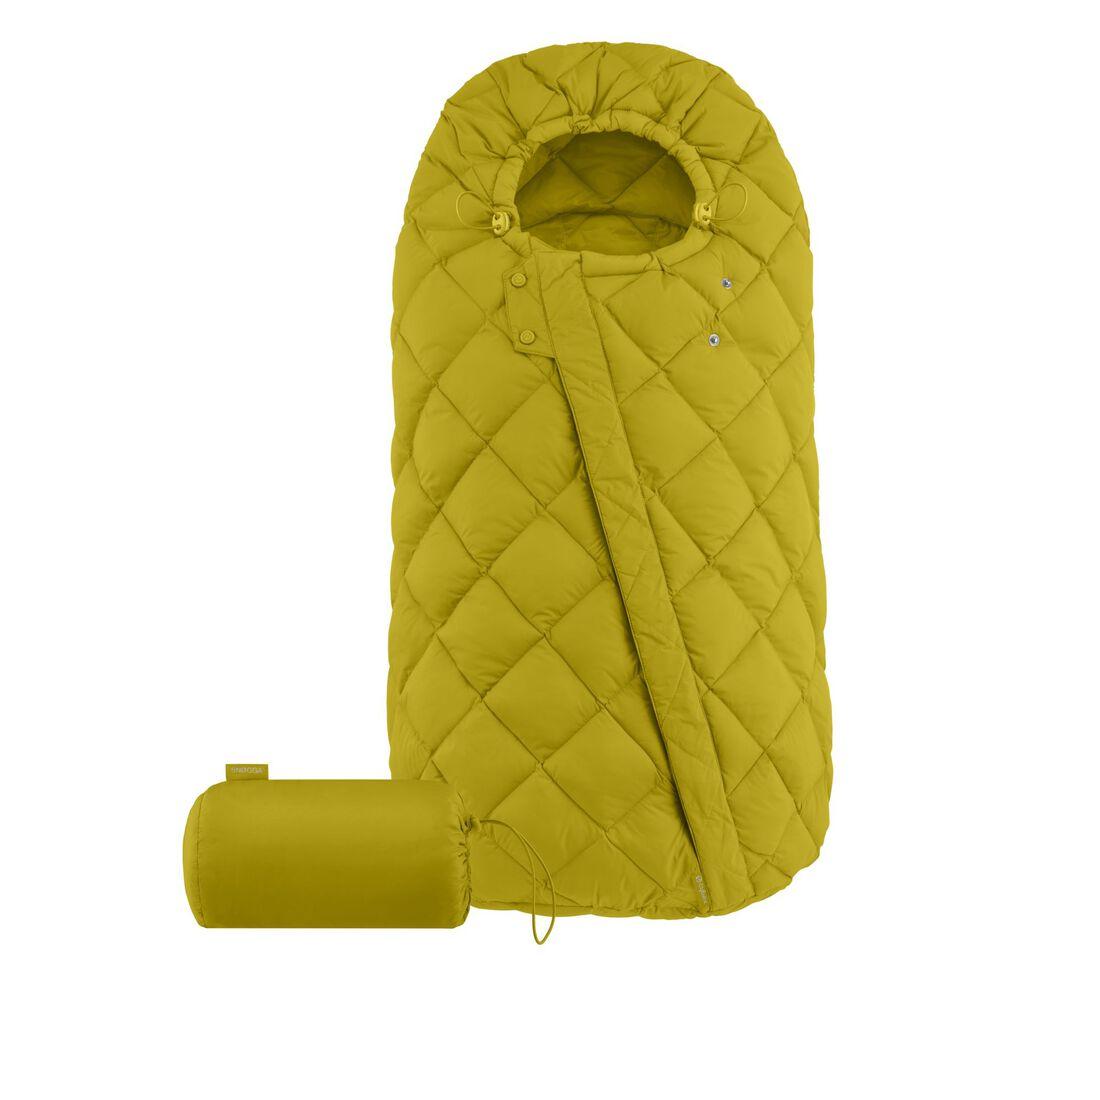 CYBEX Snogga - Mustard Yellow in Mustard Yellow large image number 1